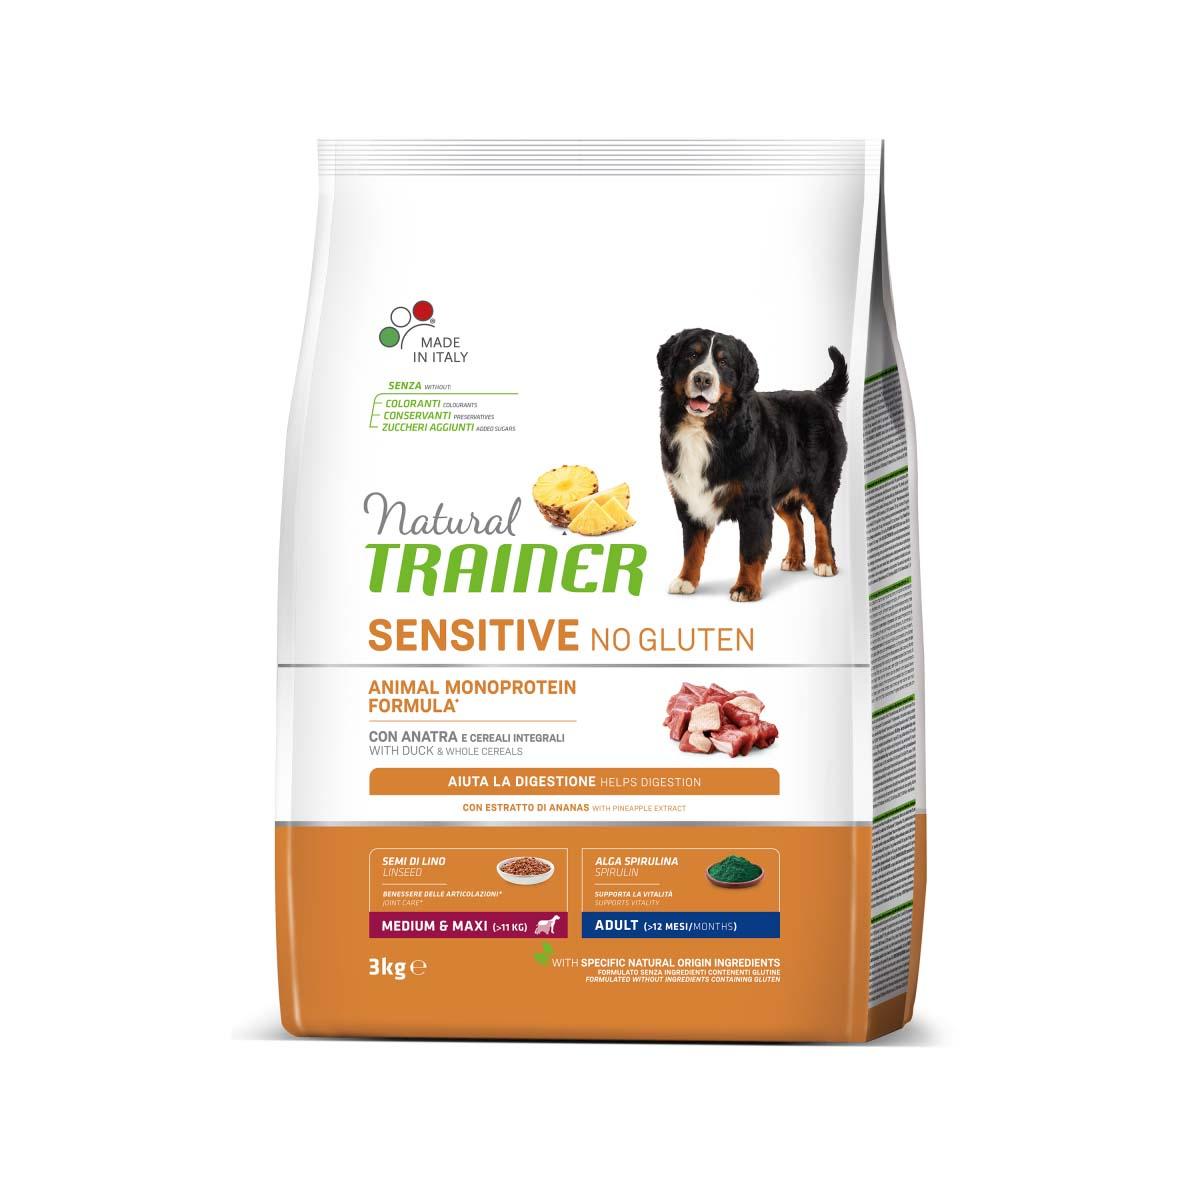 Linea Natural Trainer Sensitive 12kg